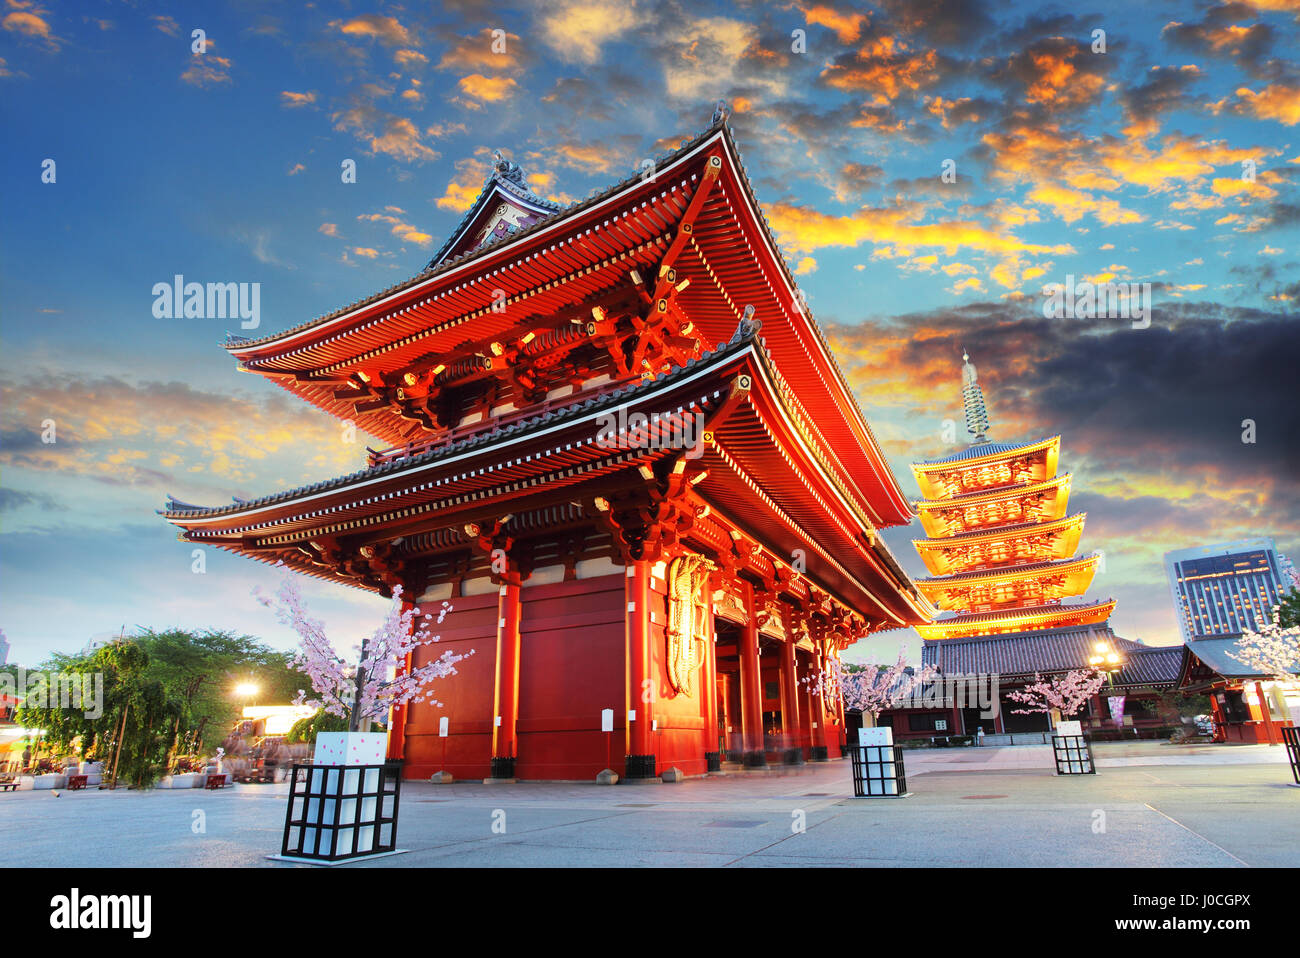 Tokyo - Sensoji-ji, Temple in Asakusa, Japan Stock Photo